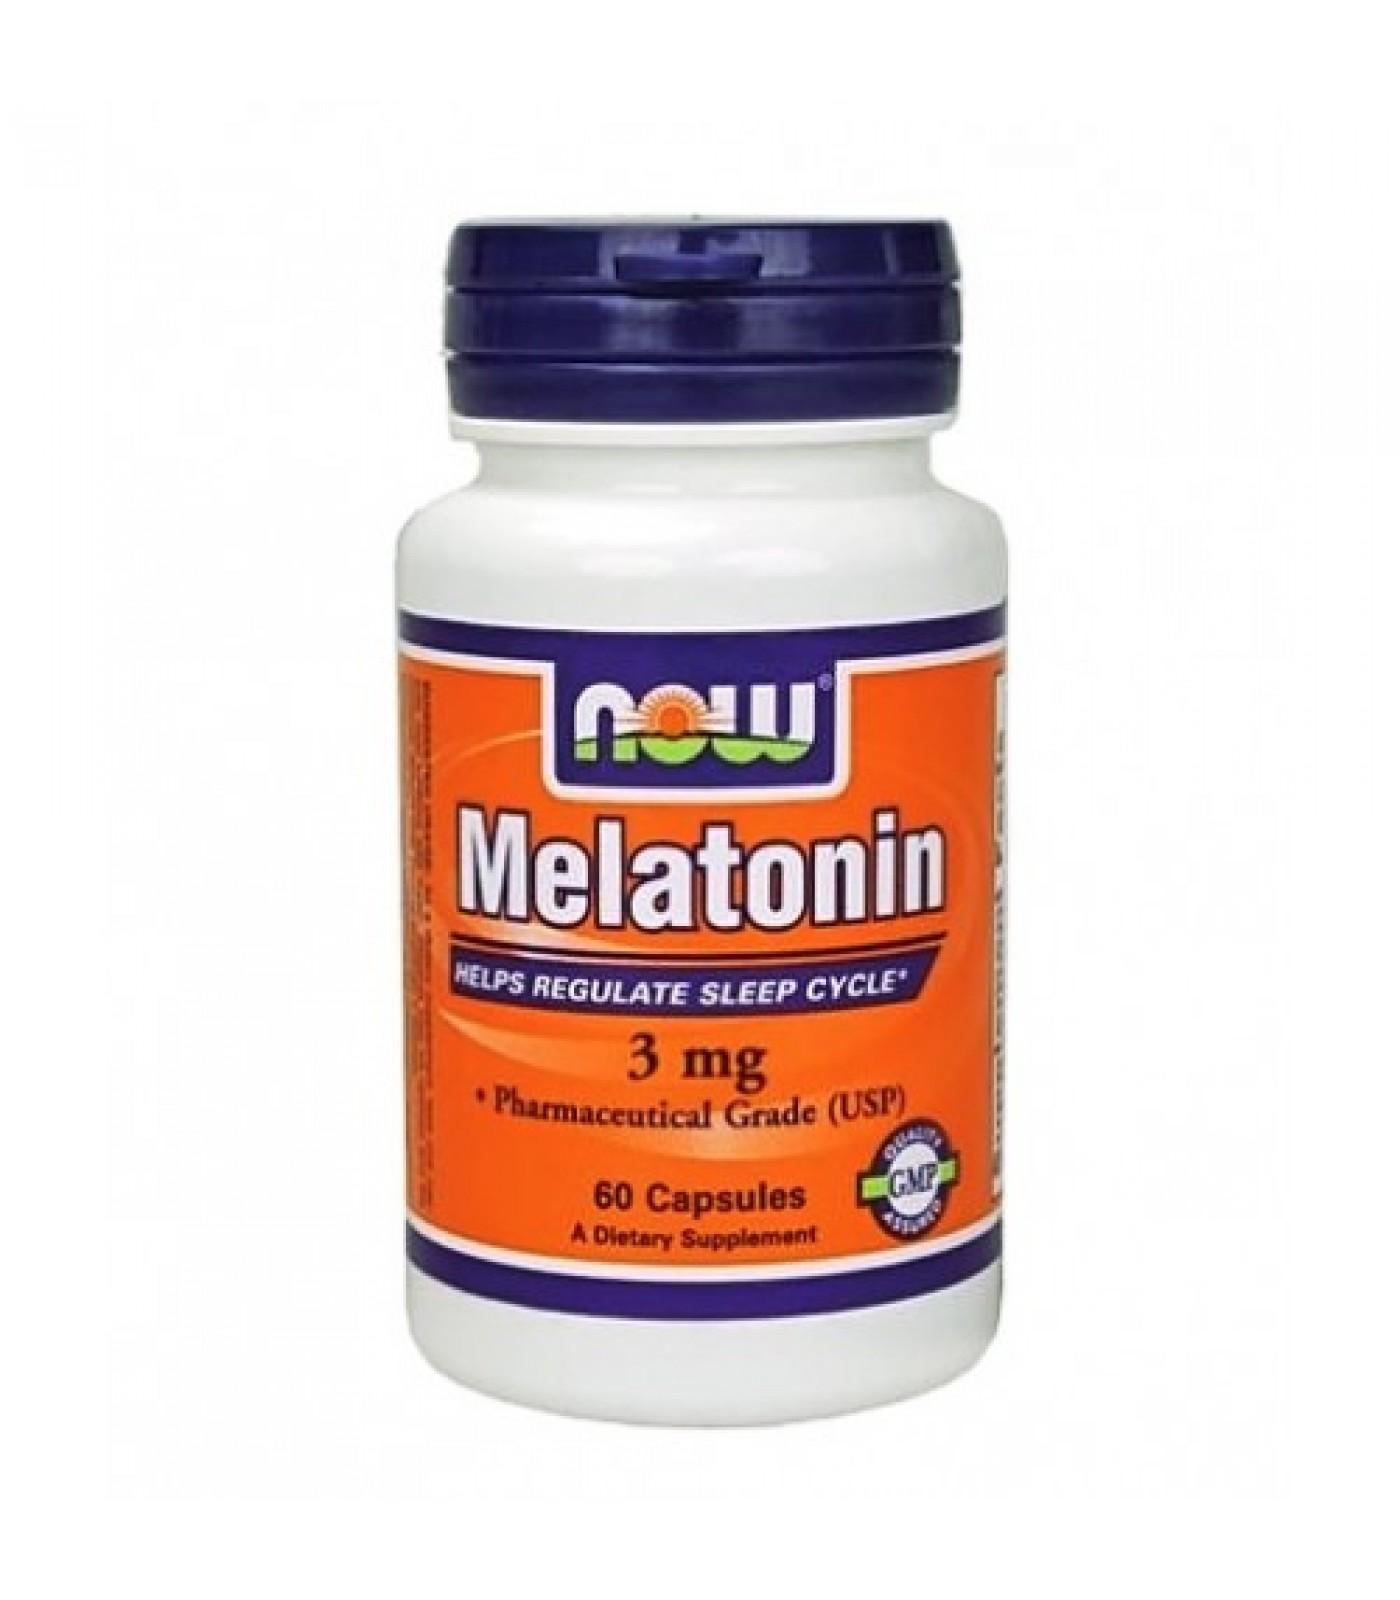 NOW - Melatonin 3mg. / 60 Caps.